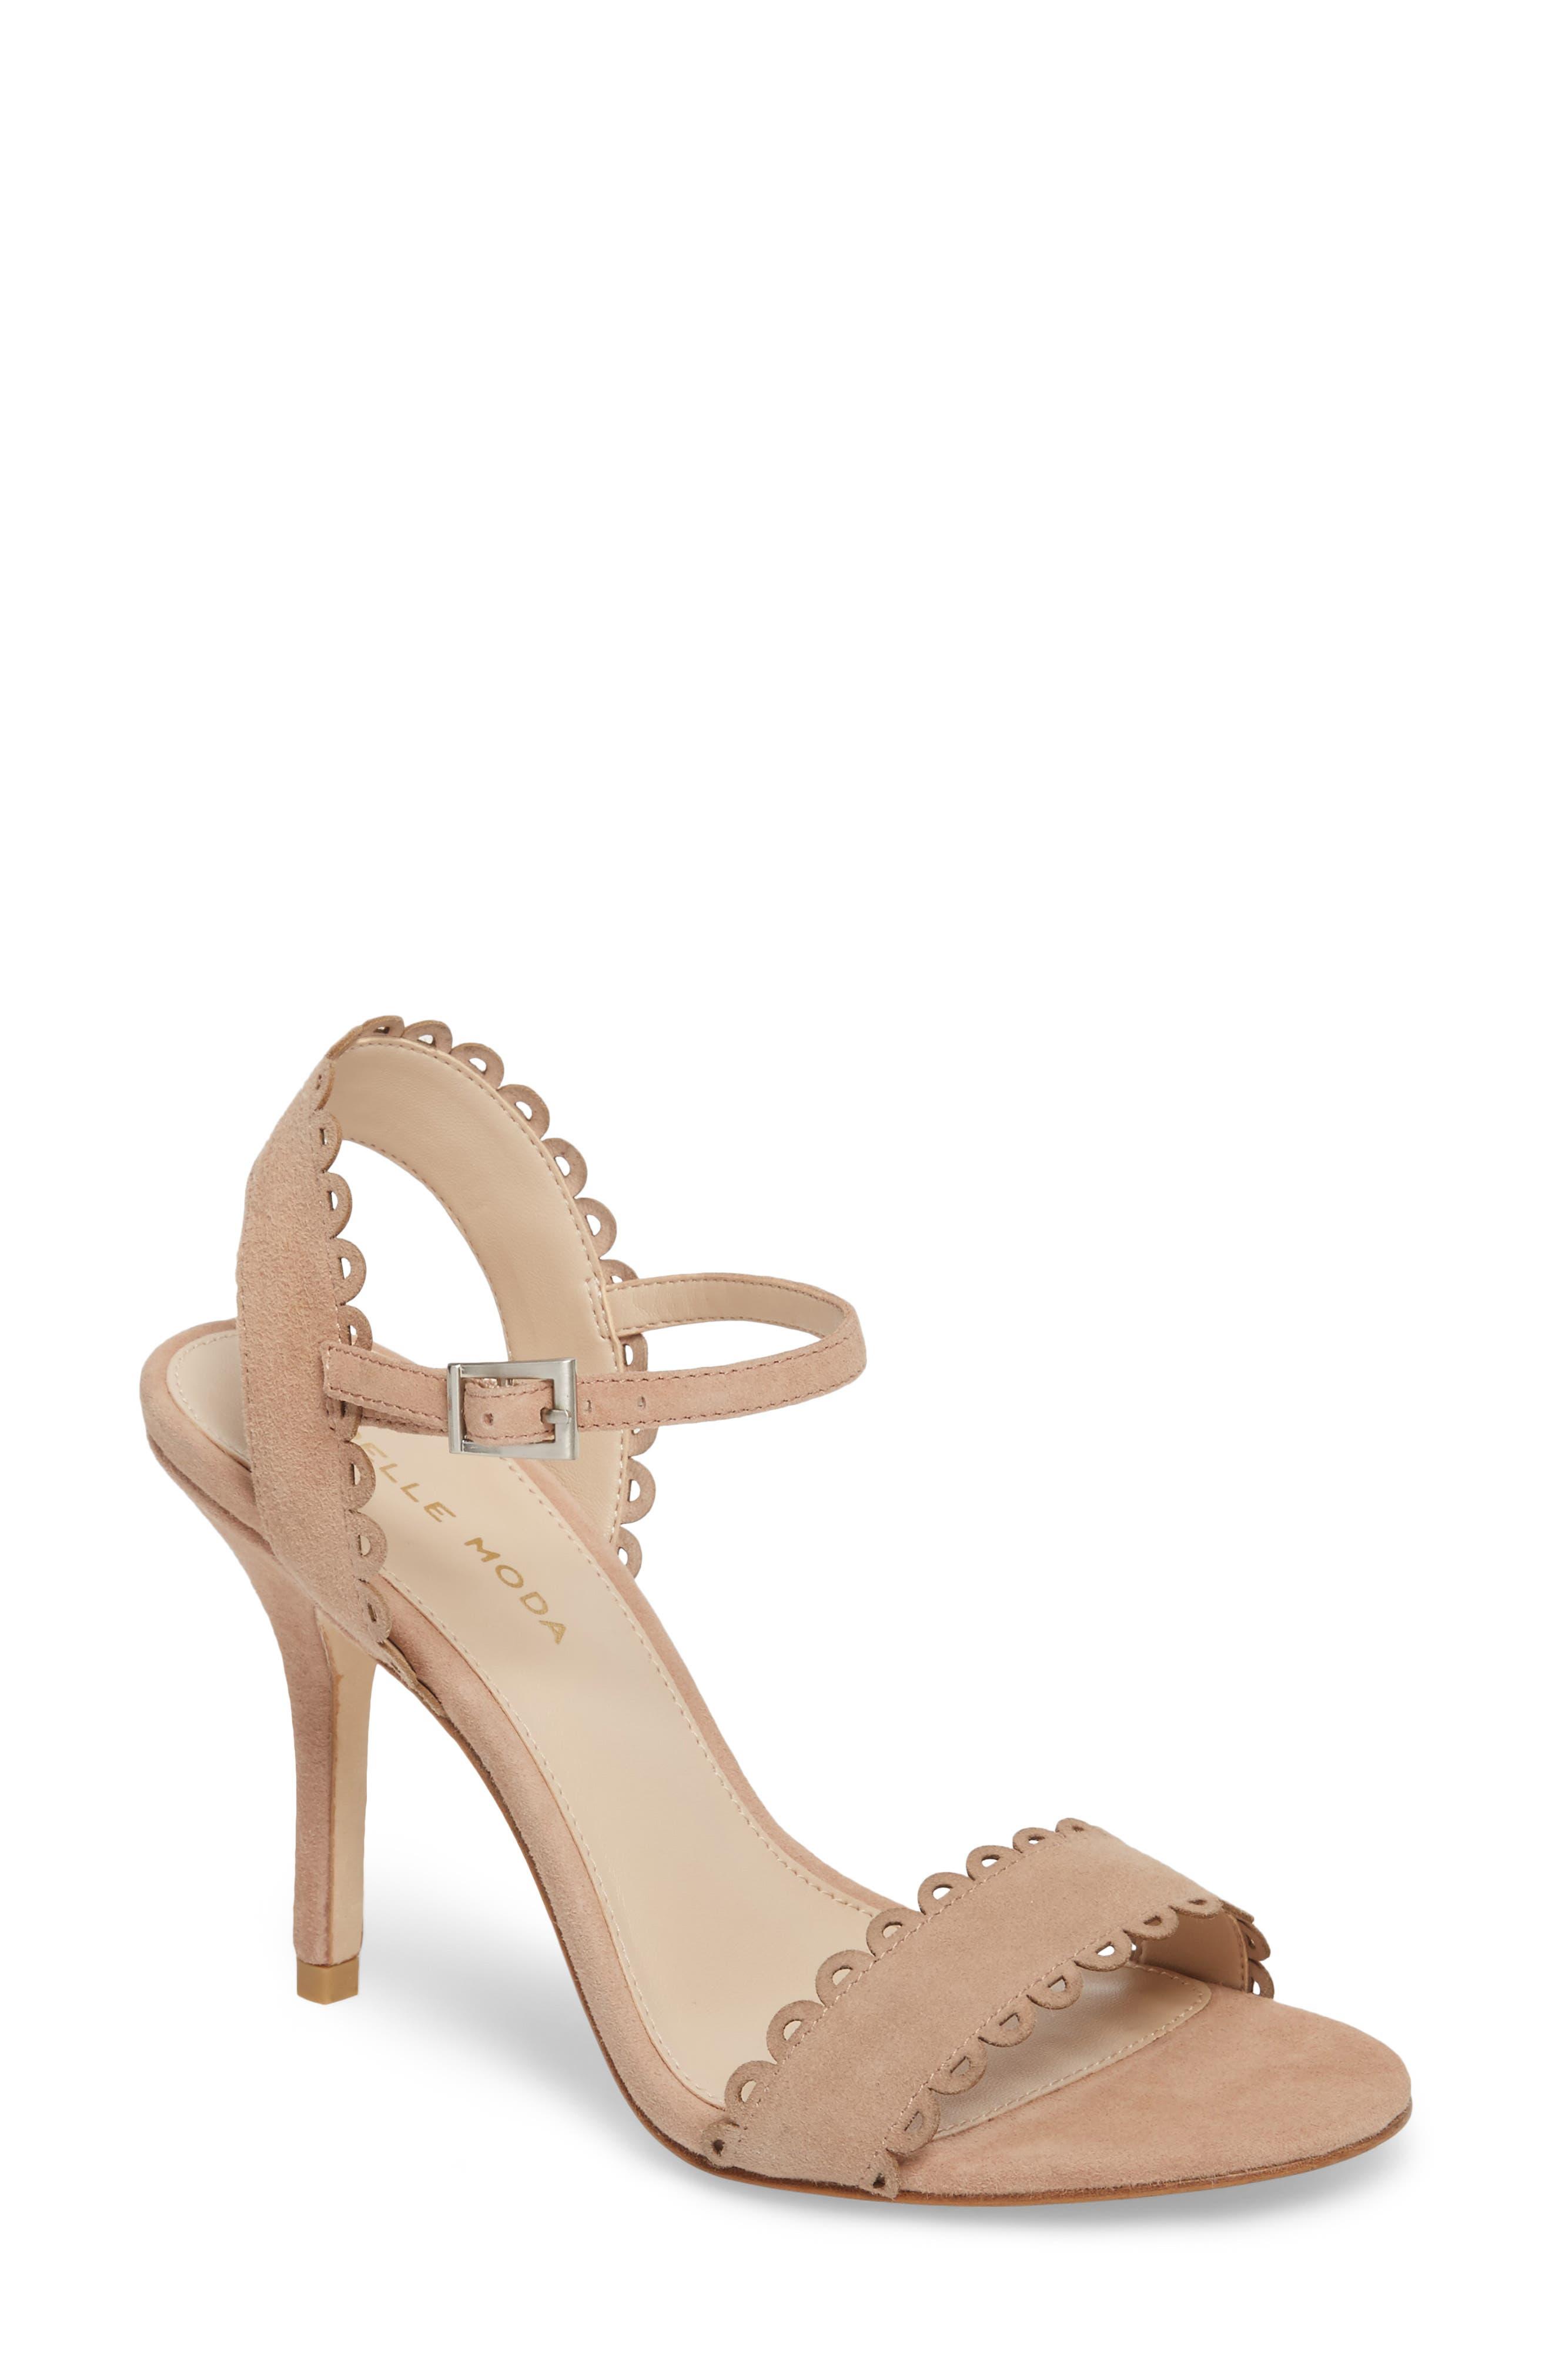 Karen Scallop Ankle Strap Sandal,                             Main thumbnail 3, color,